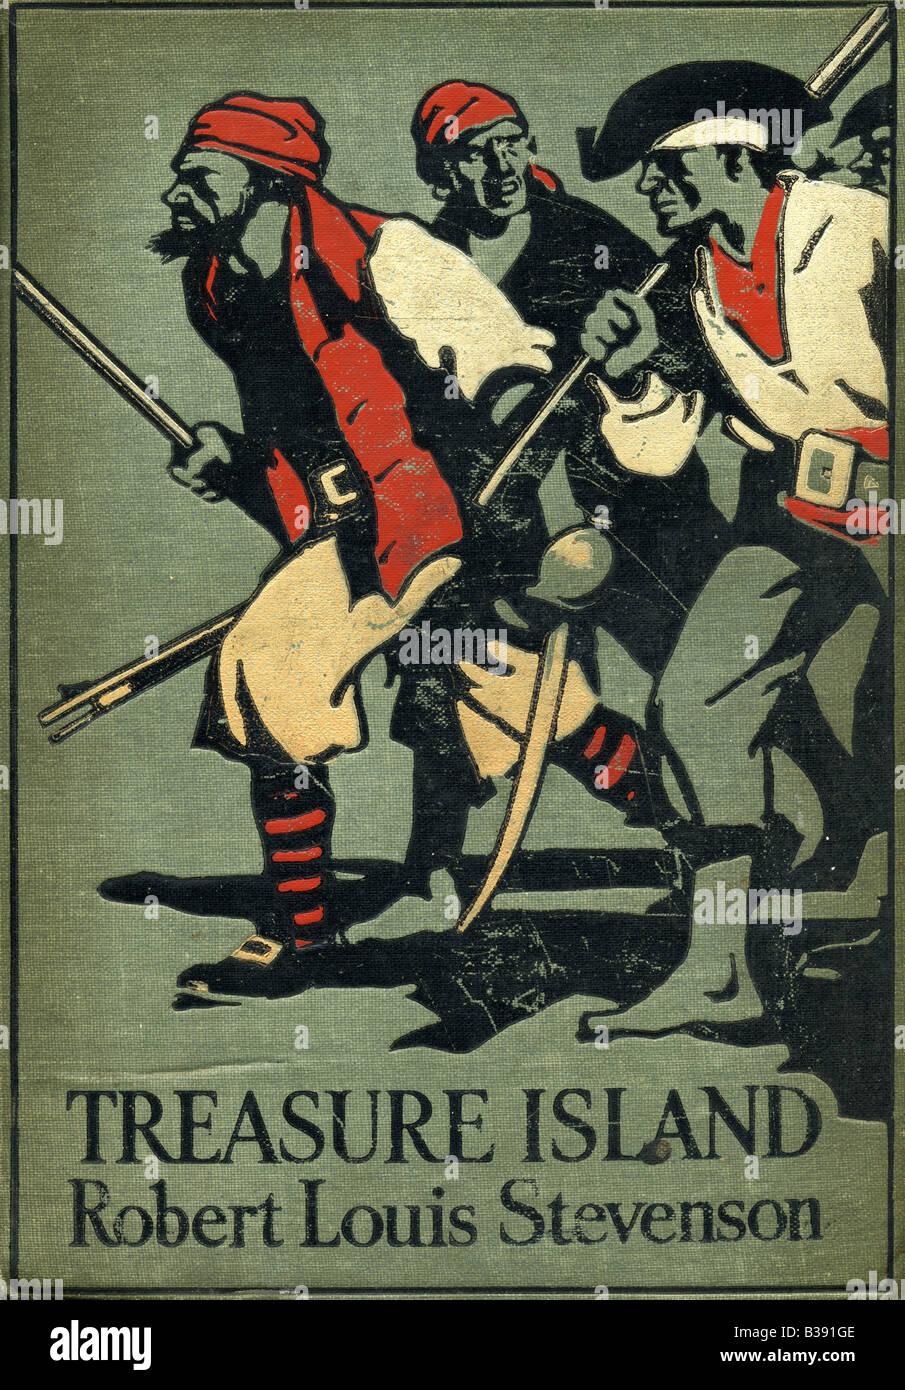 Treasure Island Stevenson Stock Photos & Treasure Island Stevenson ...